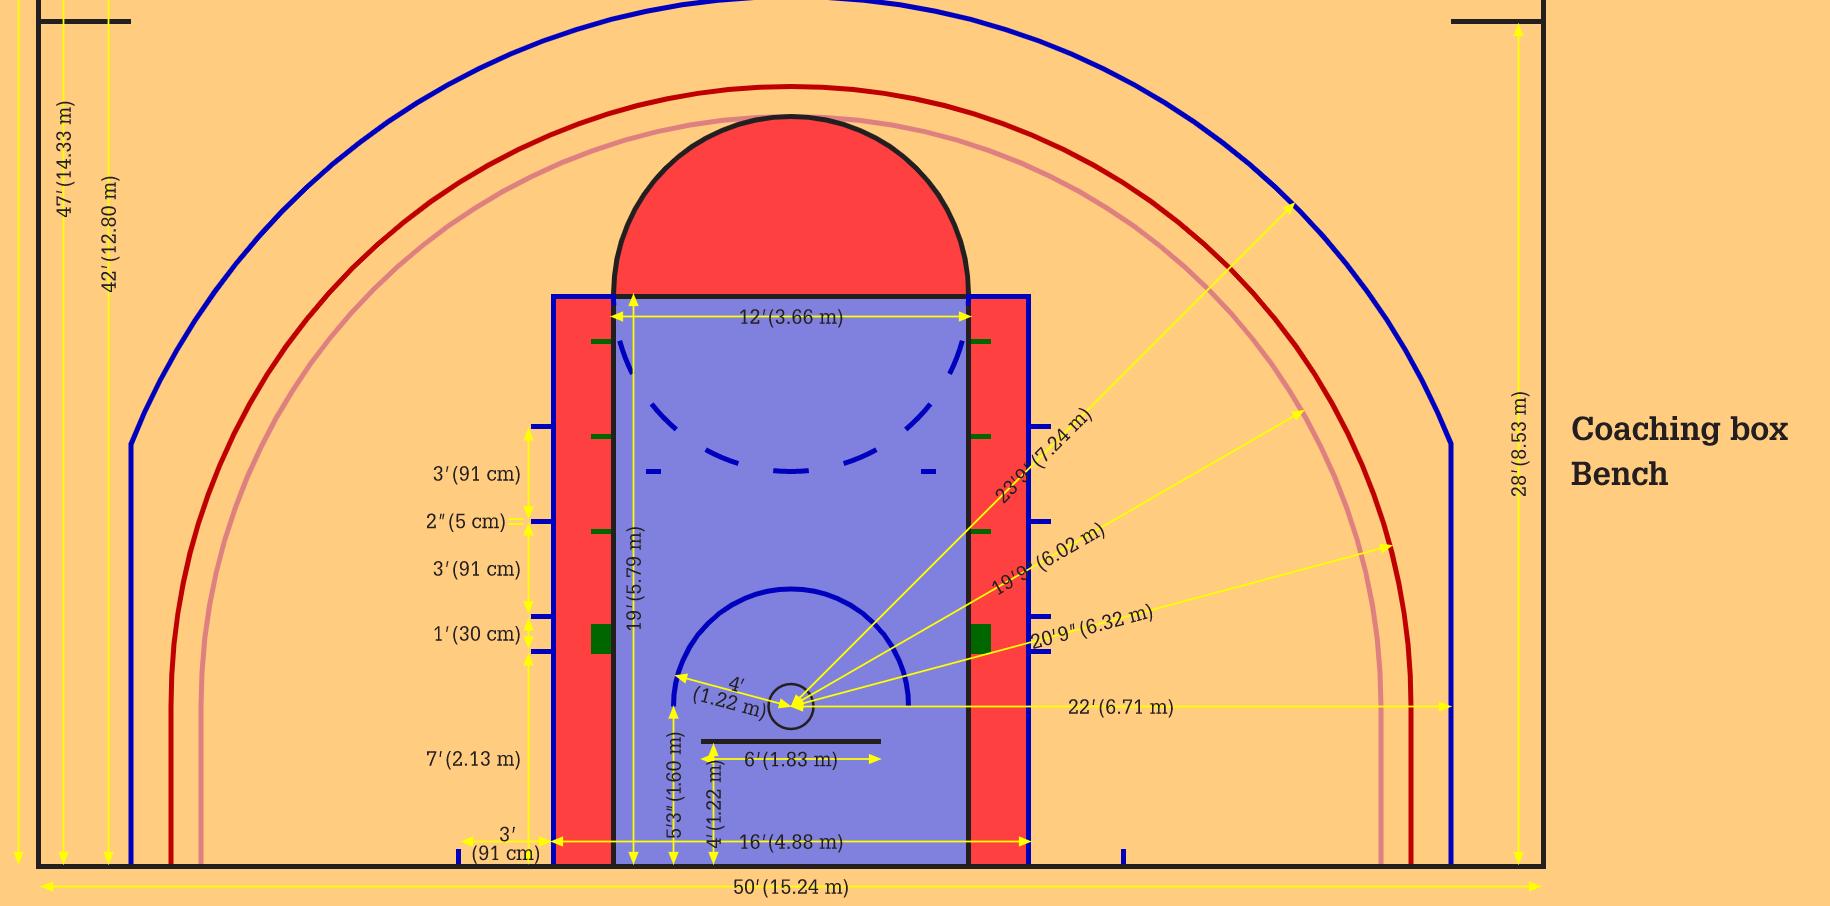 Basketball Court Dimensions Guide (Australia) FIBA & NBA ...